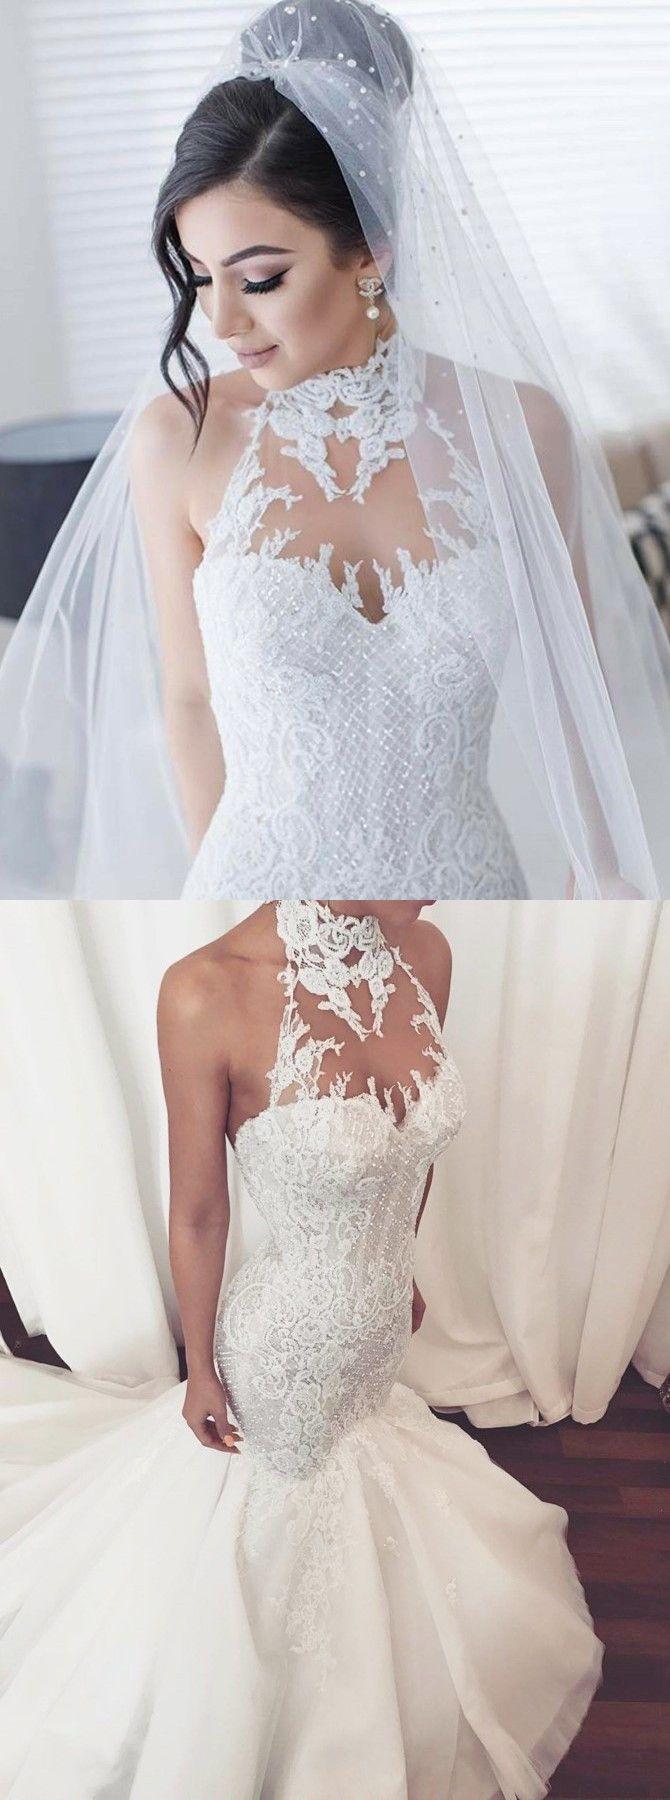 Lace wedding dress halter  mermaid halter wedding gowns with appliques fashion formal wedding